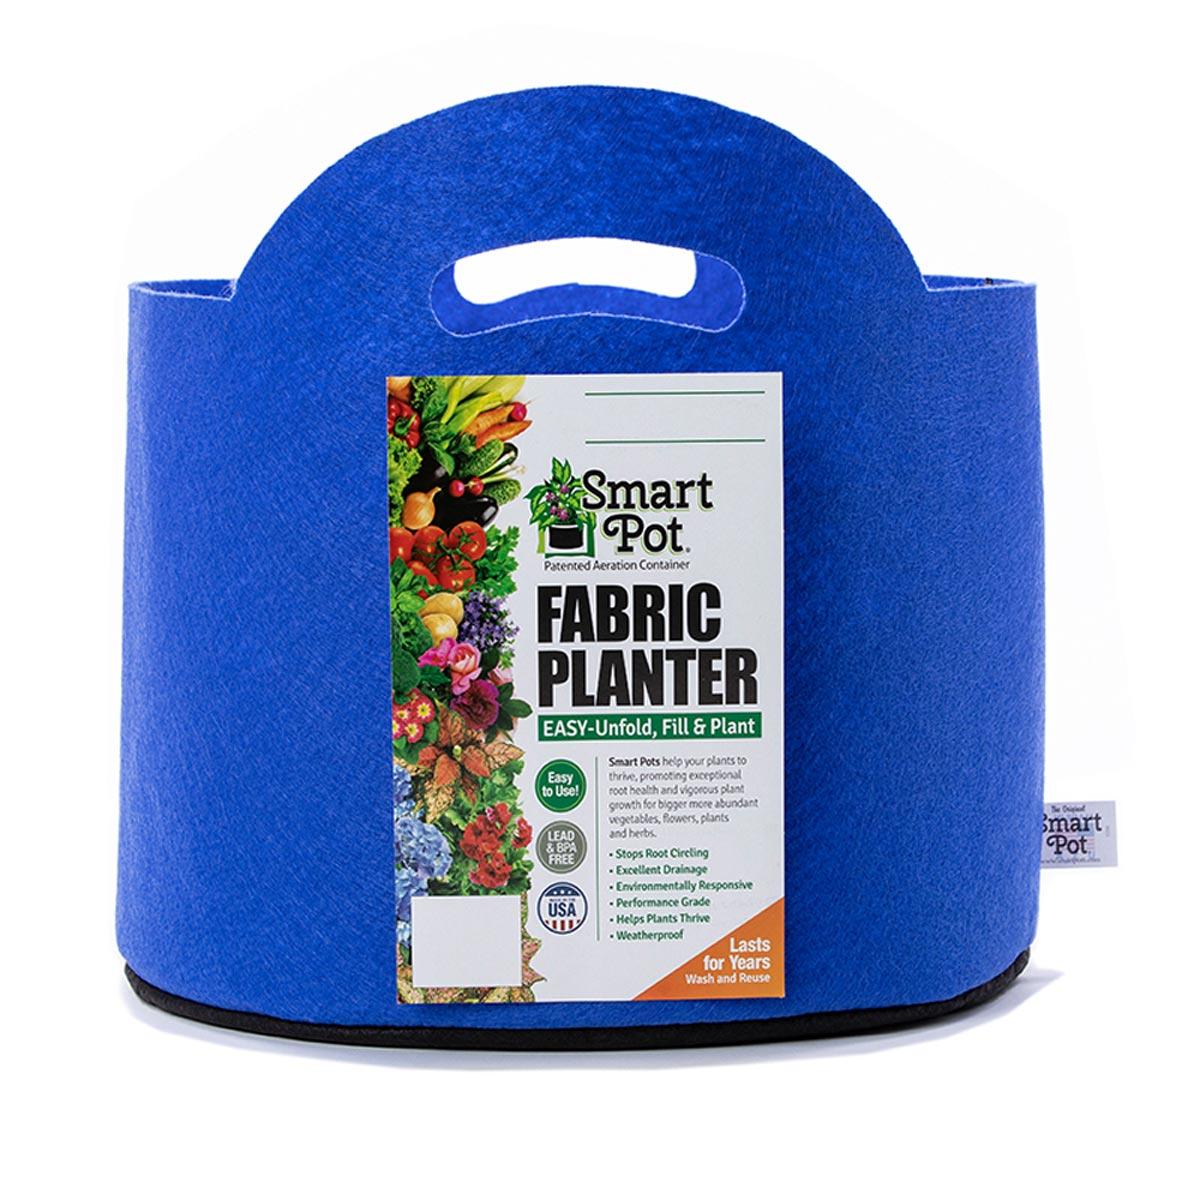 Smart Pot 3 Gallon Fabric Planter (with Handles), Blueberry